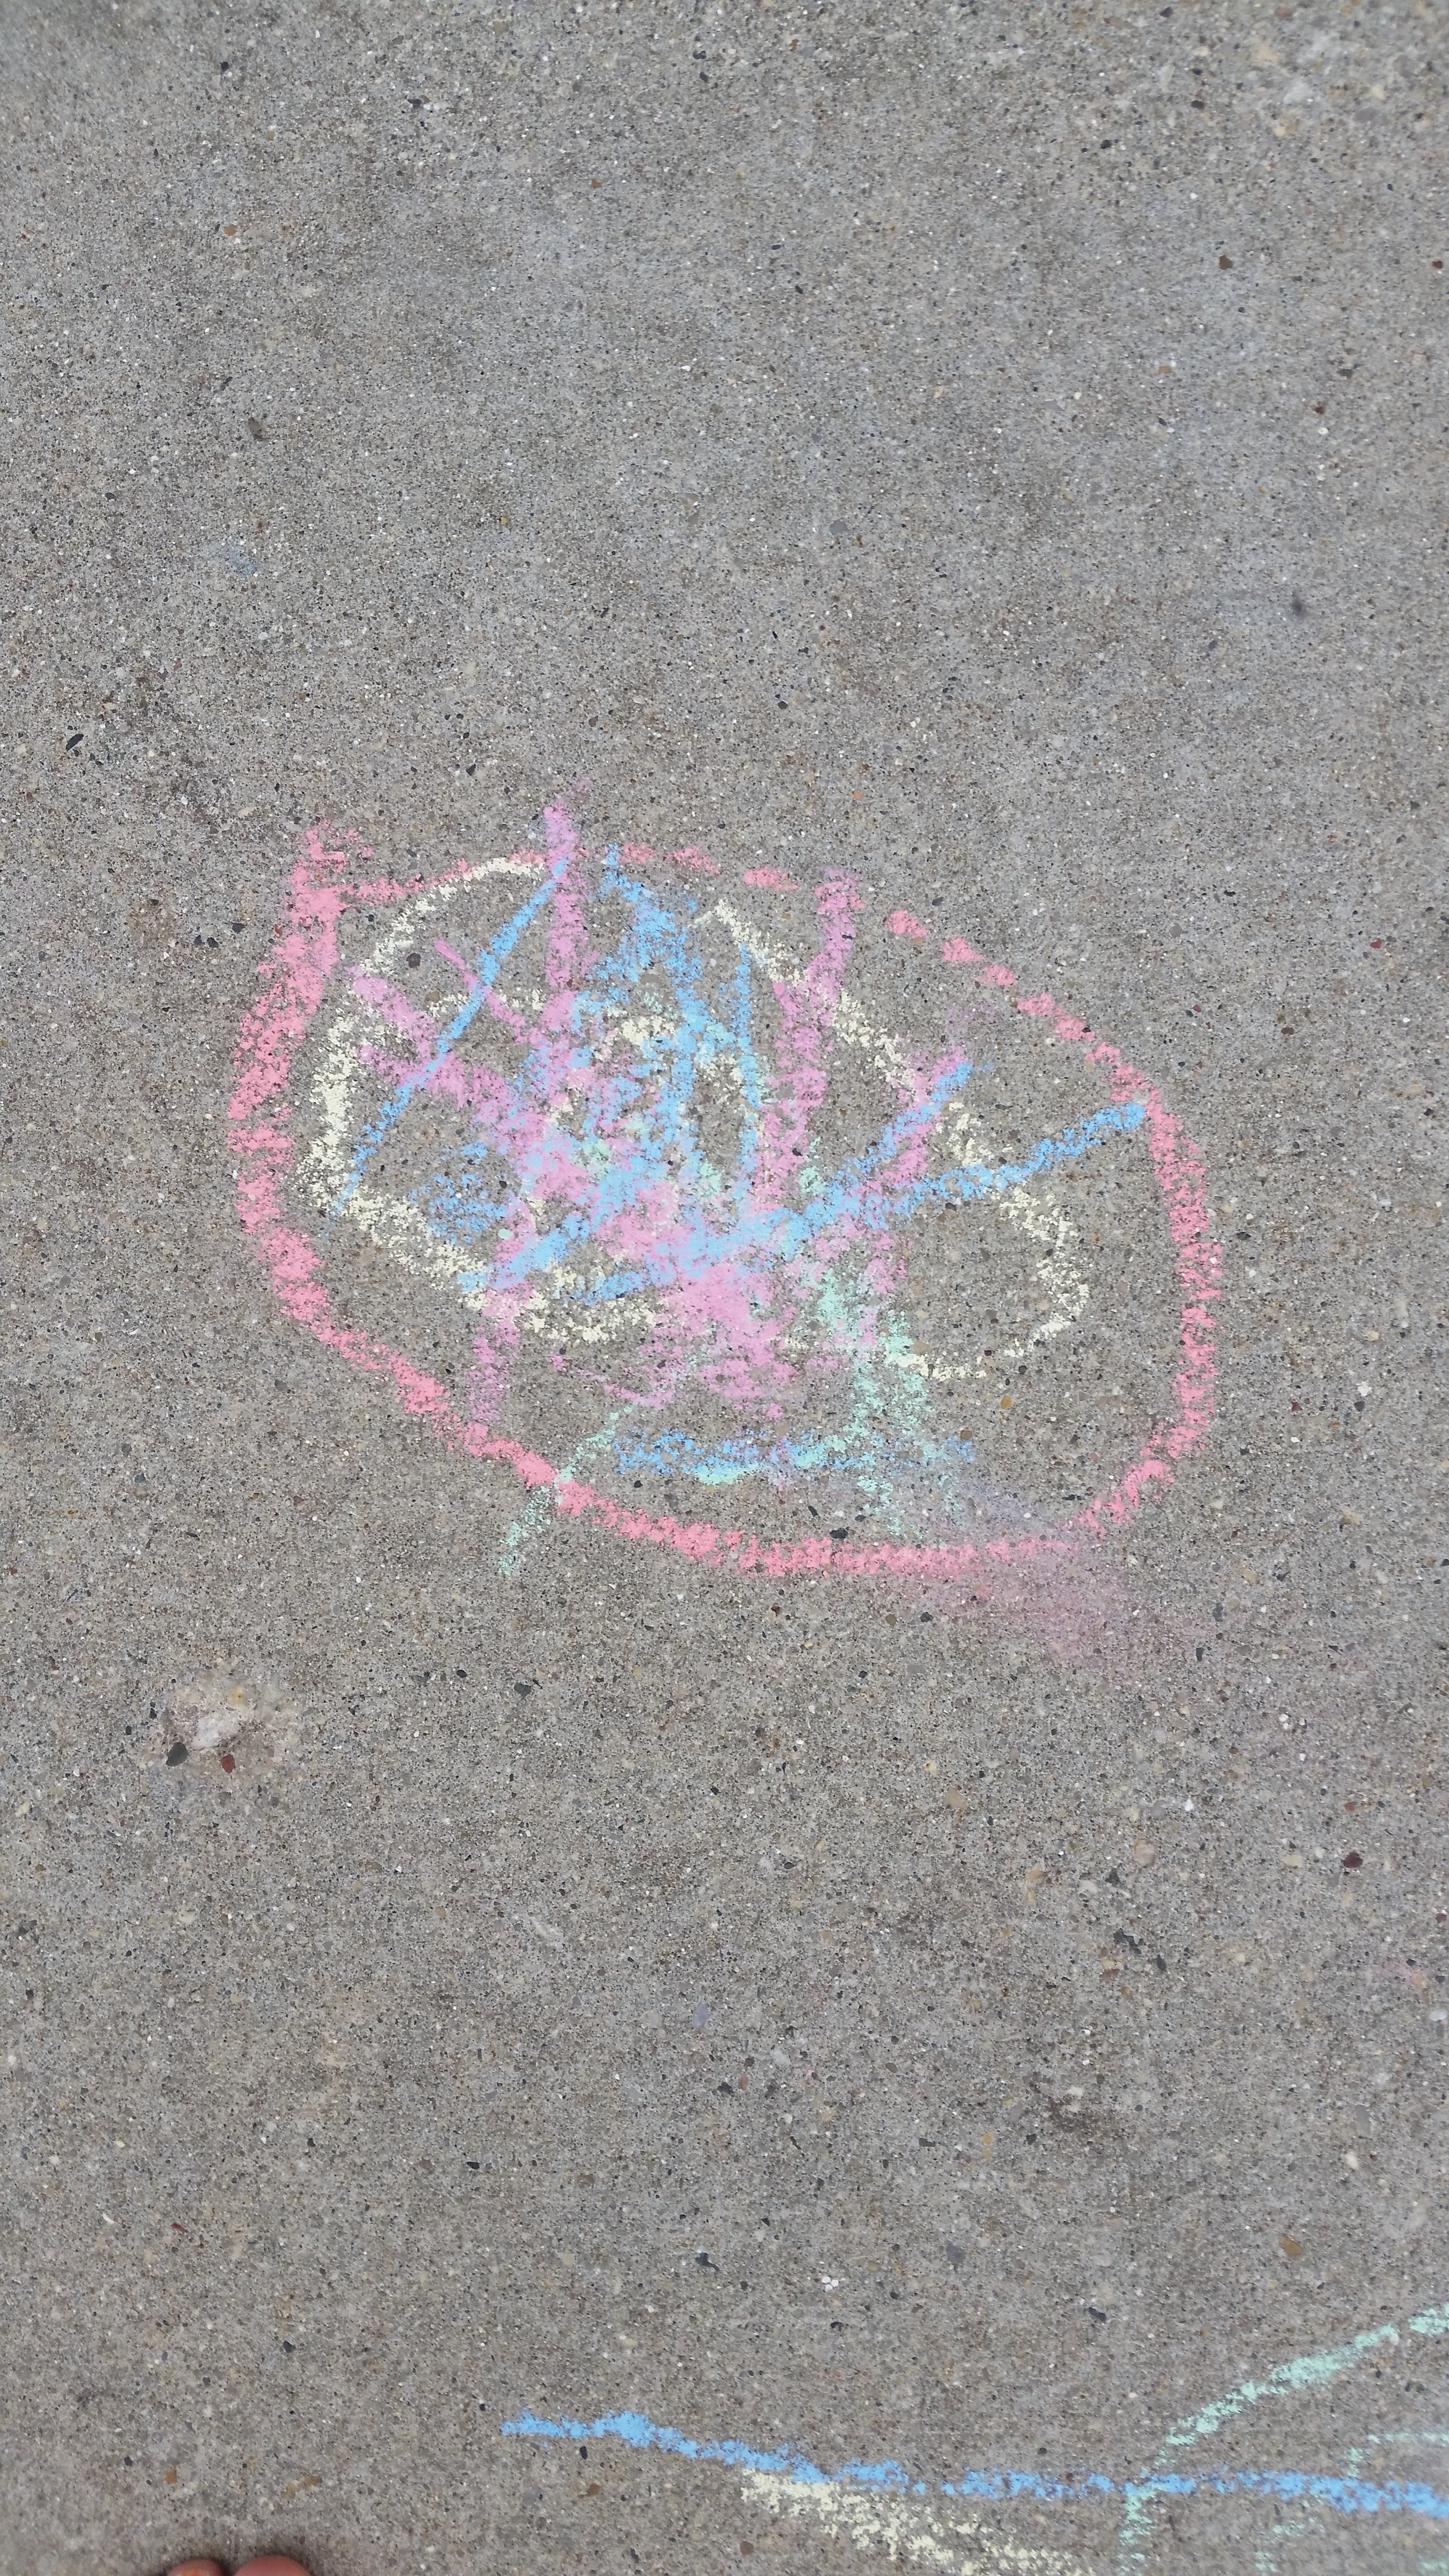 Free stock photo of chalk art, sidewalk chalk